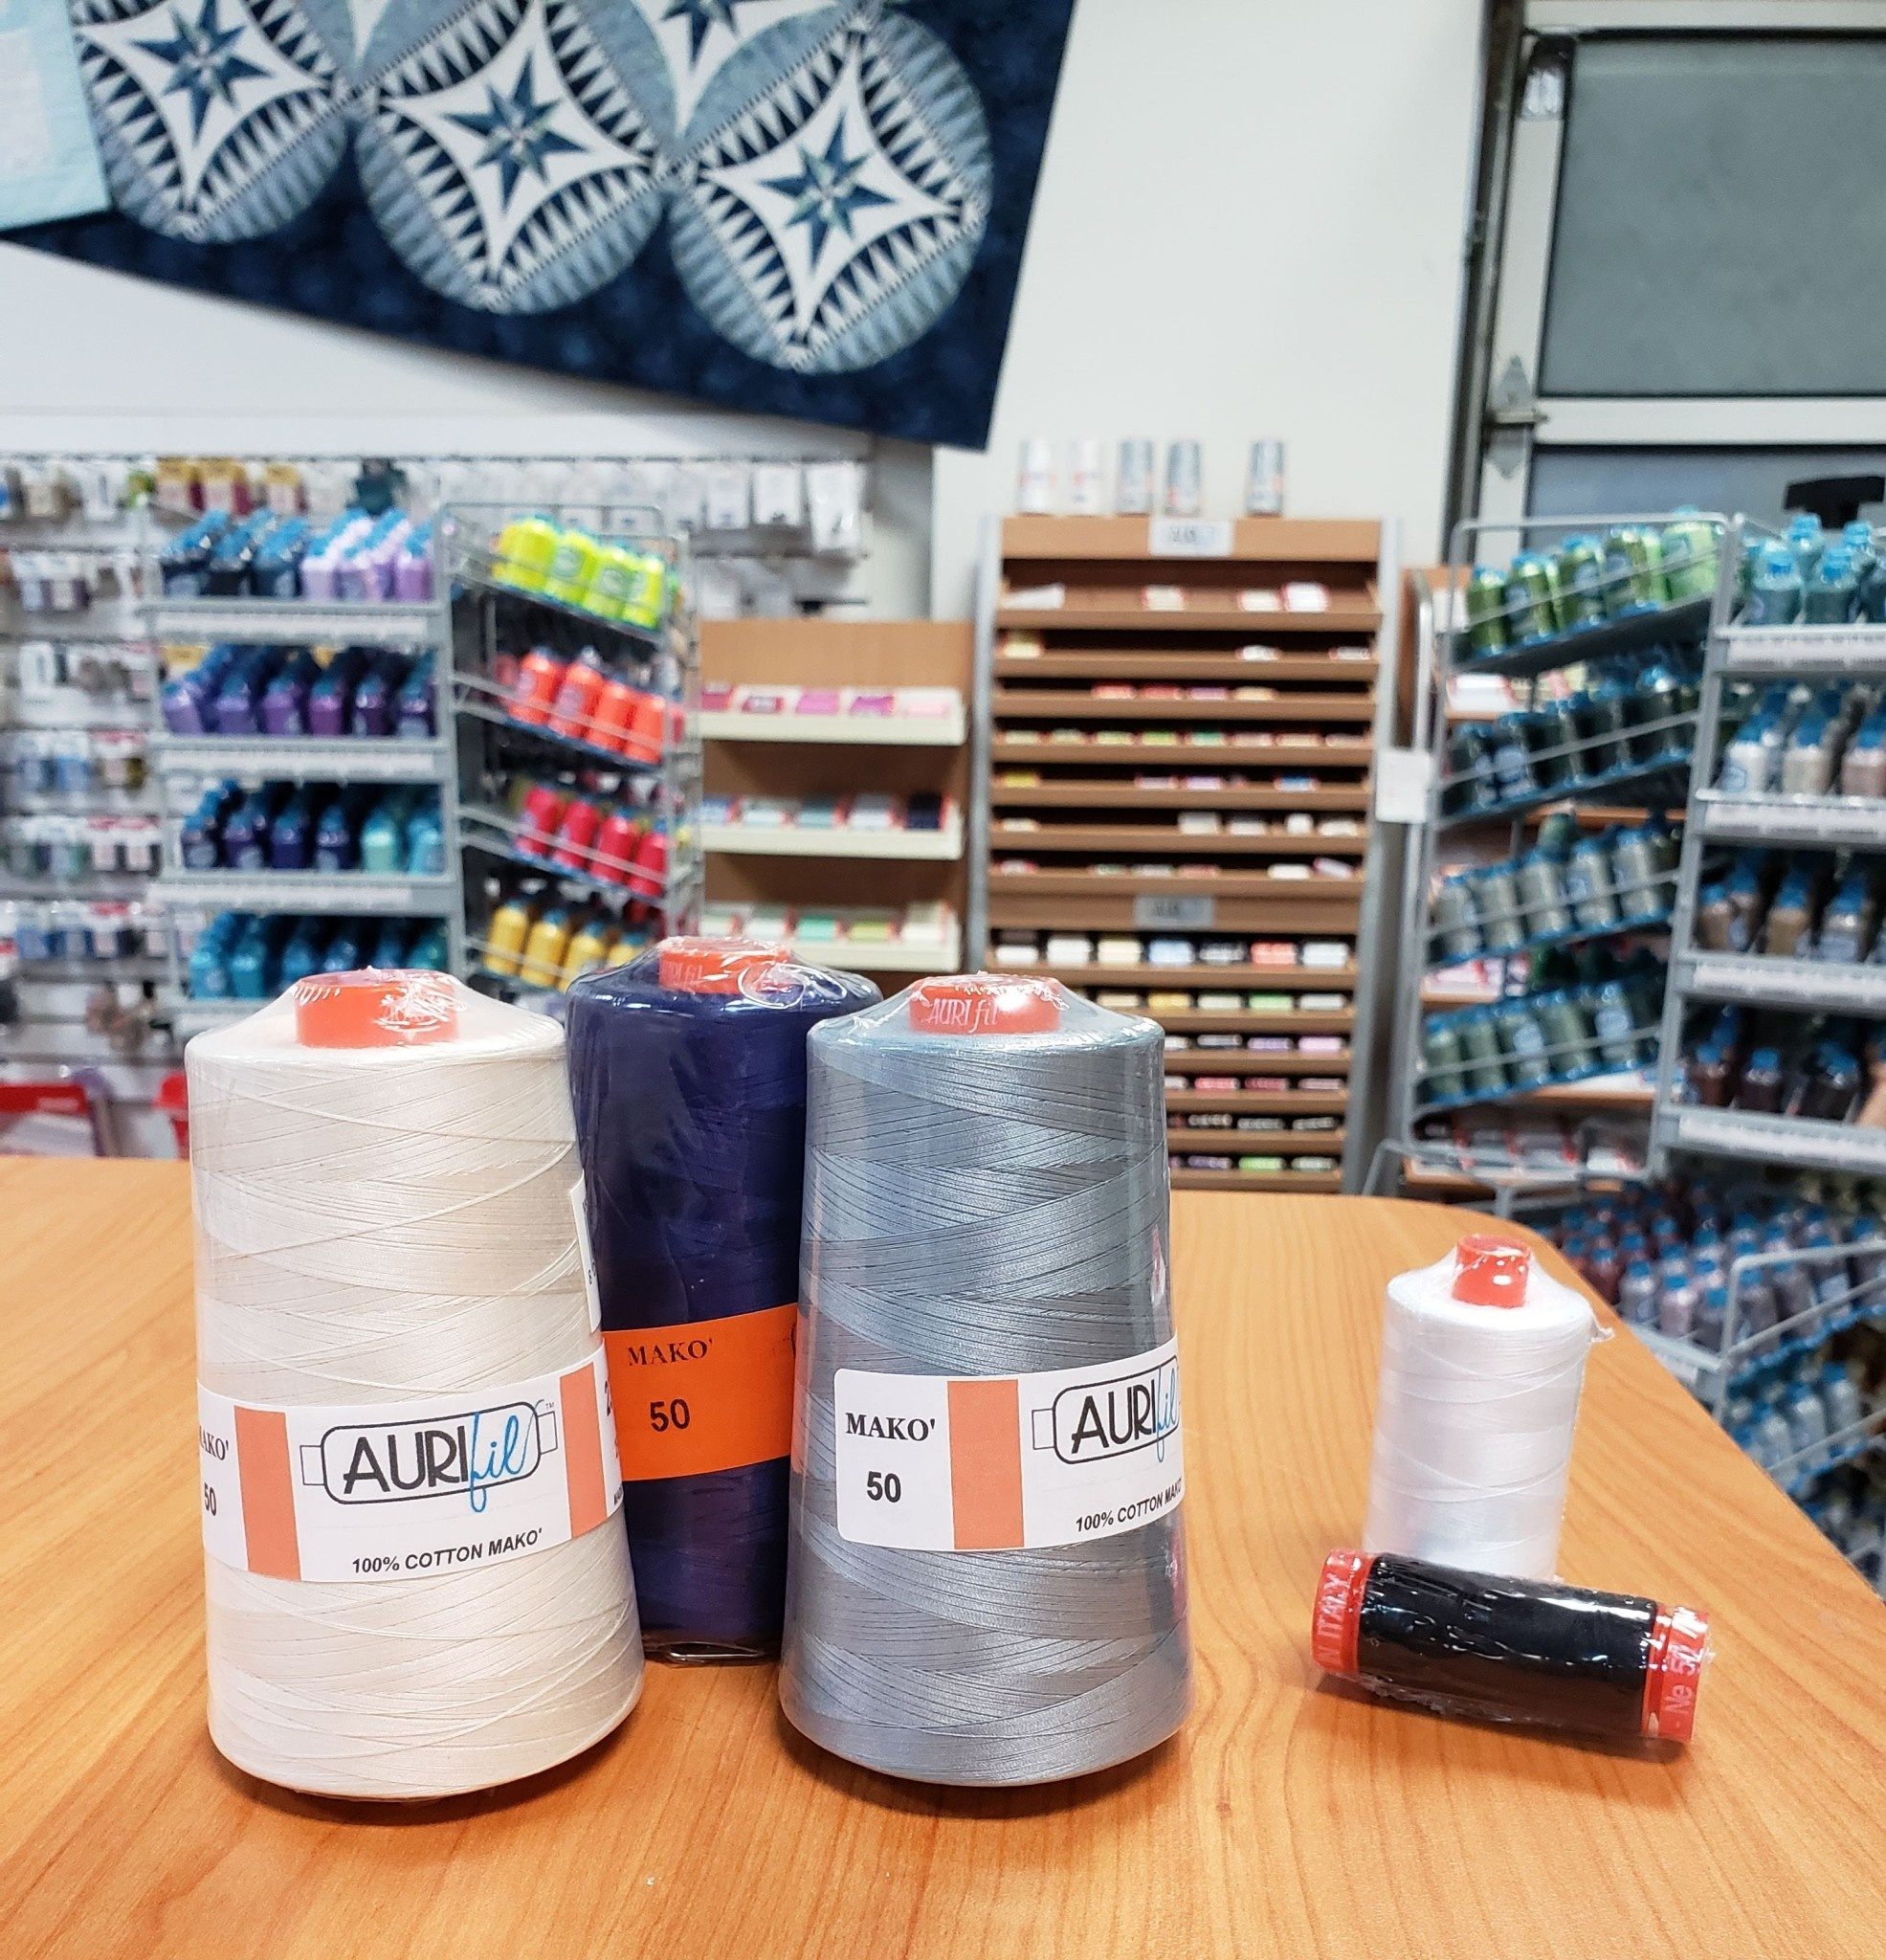 AURIFIL 3 pack of 50 WT CONE Grey, Beige, Blue